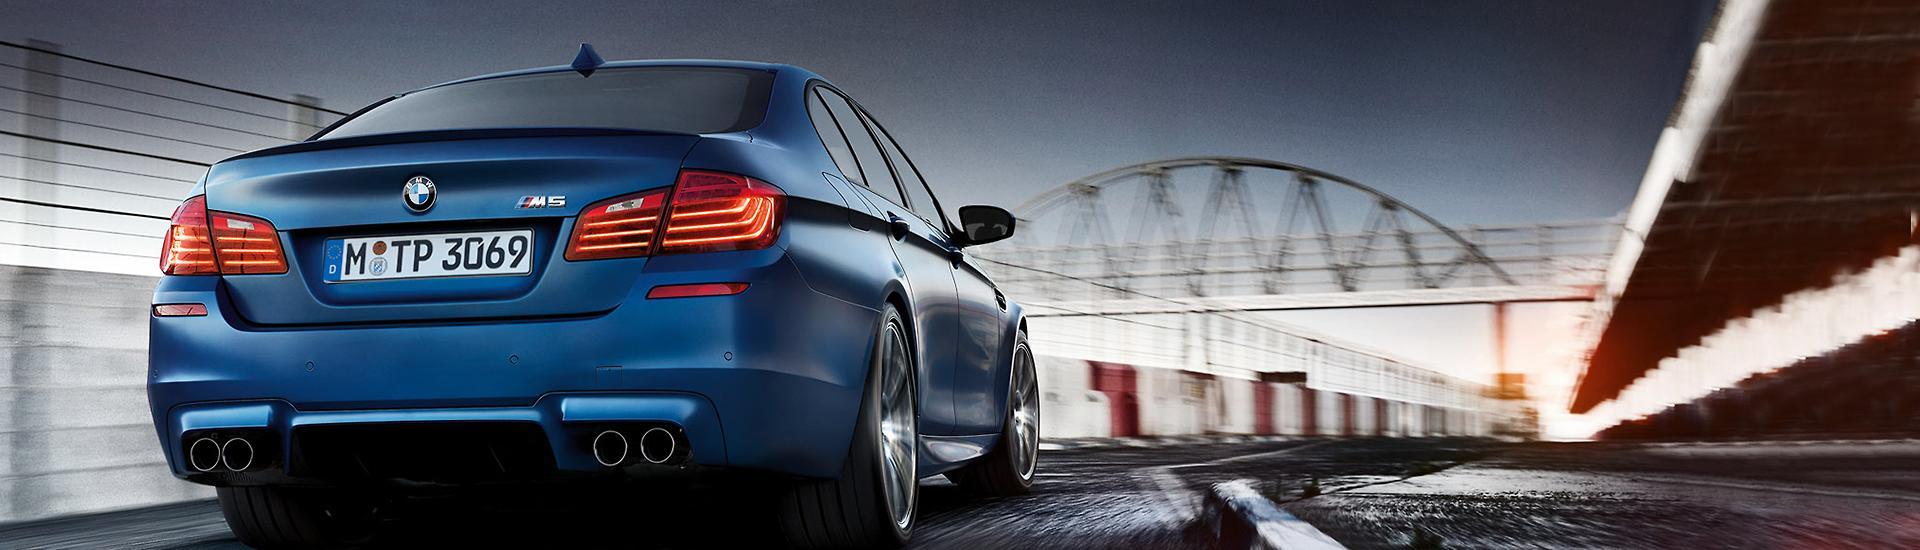 New BMW M5 Sedan Cars For Sale - carsales.com.au